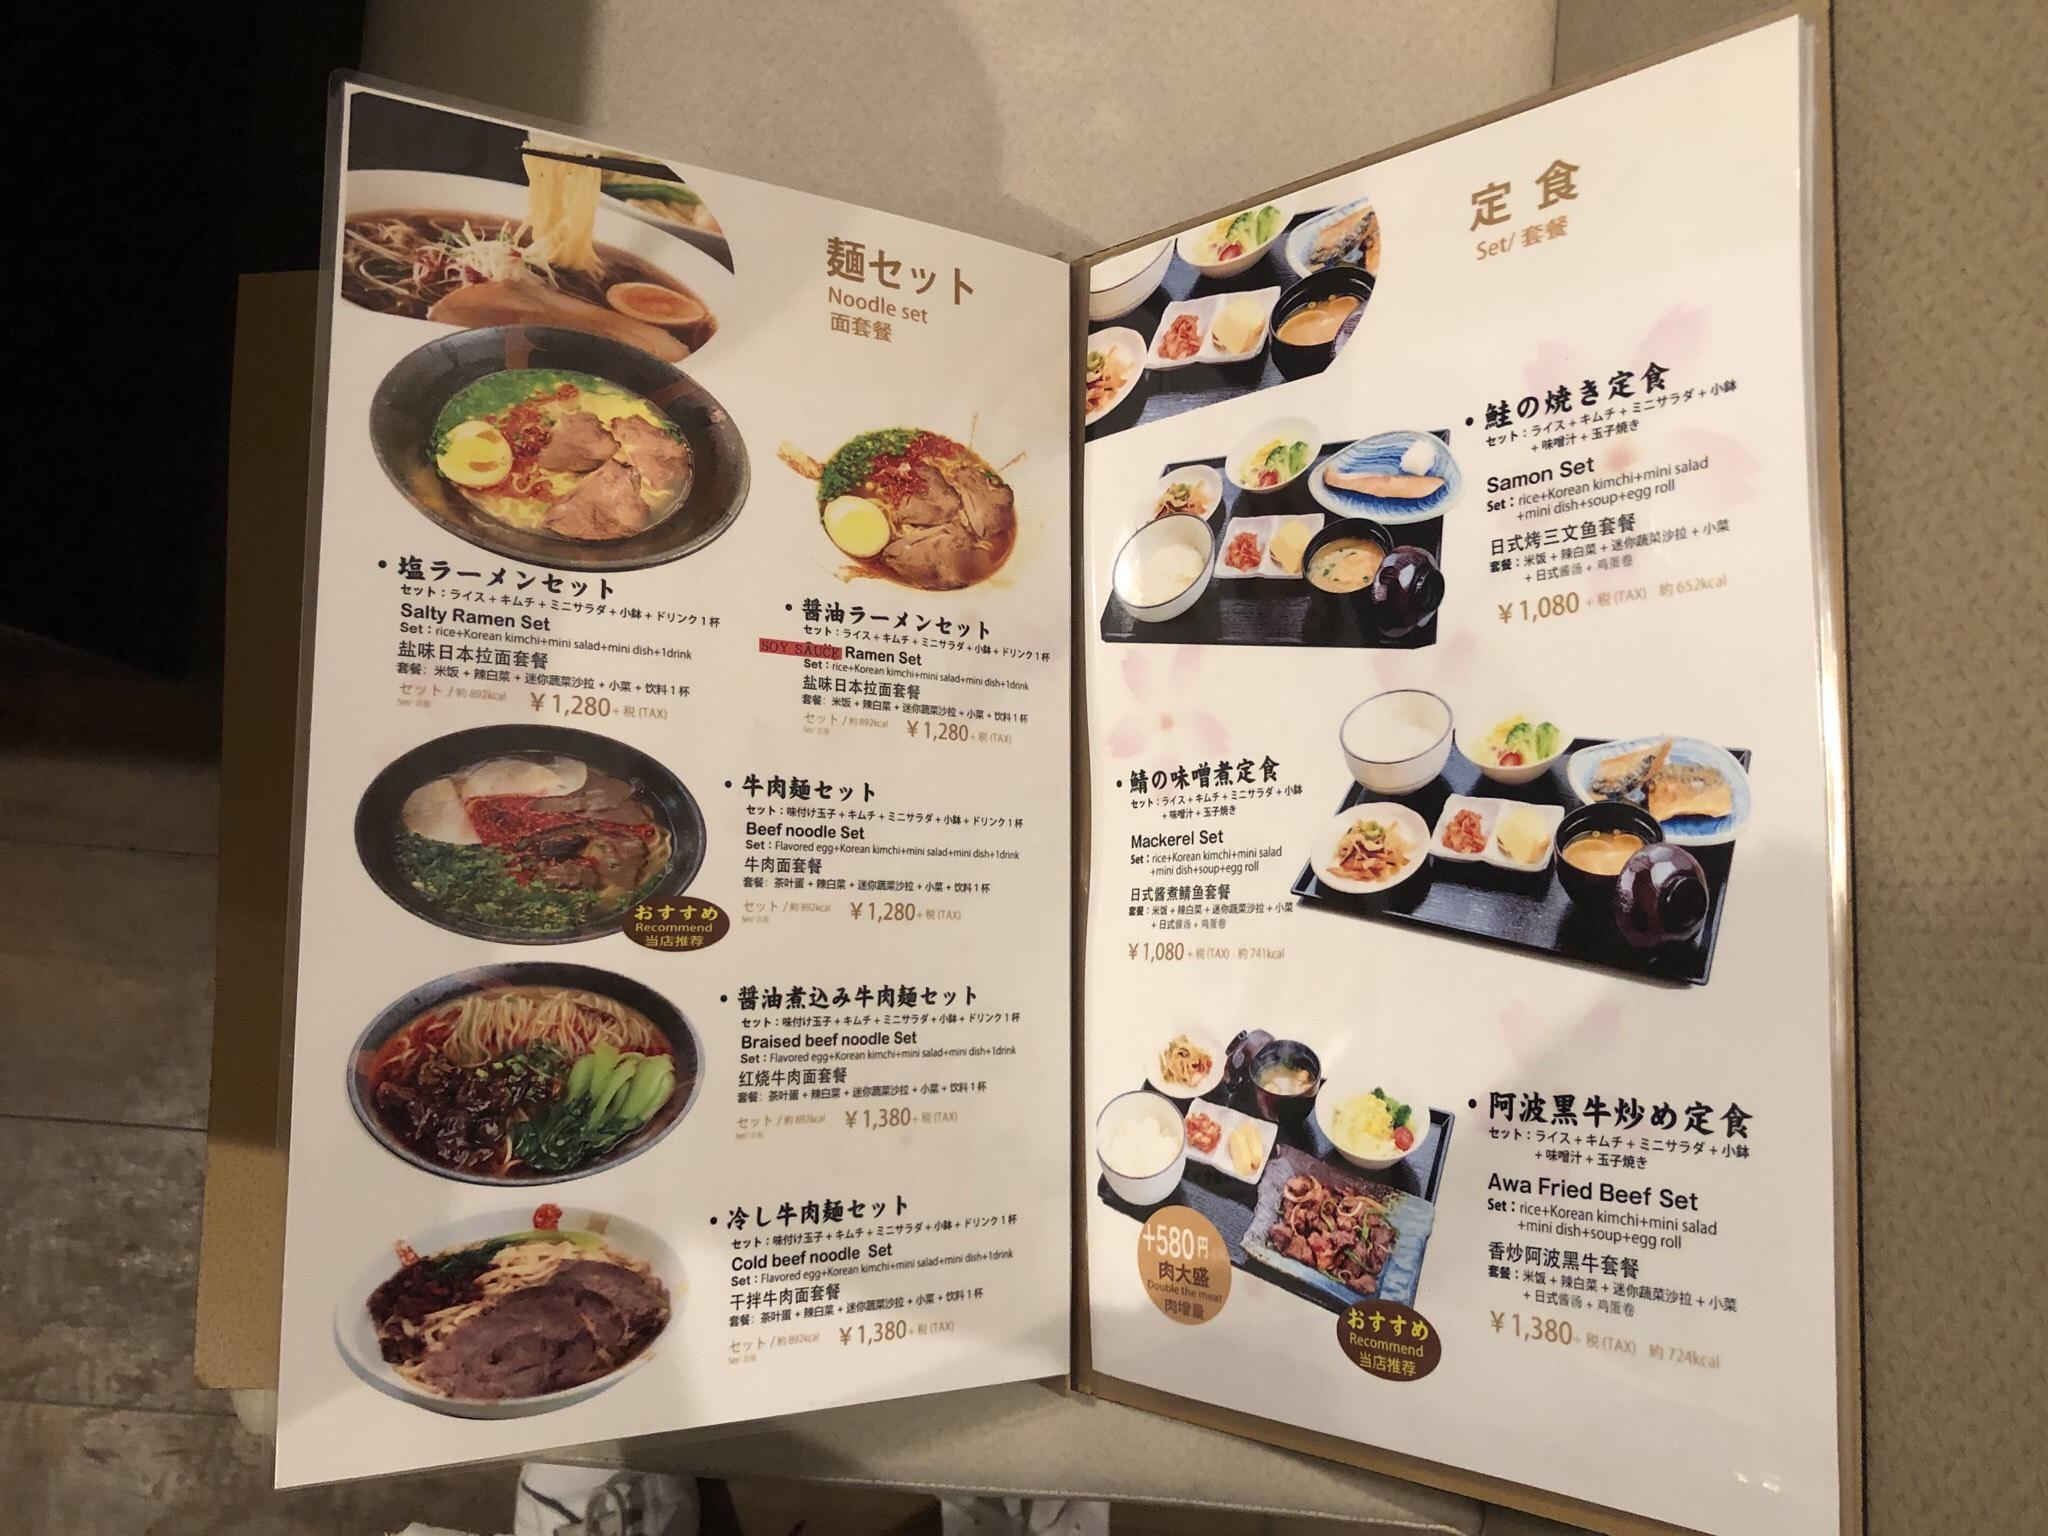 halal sakura menu